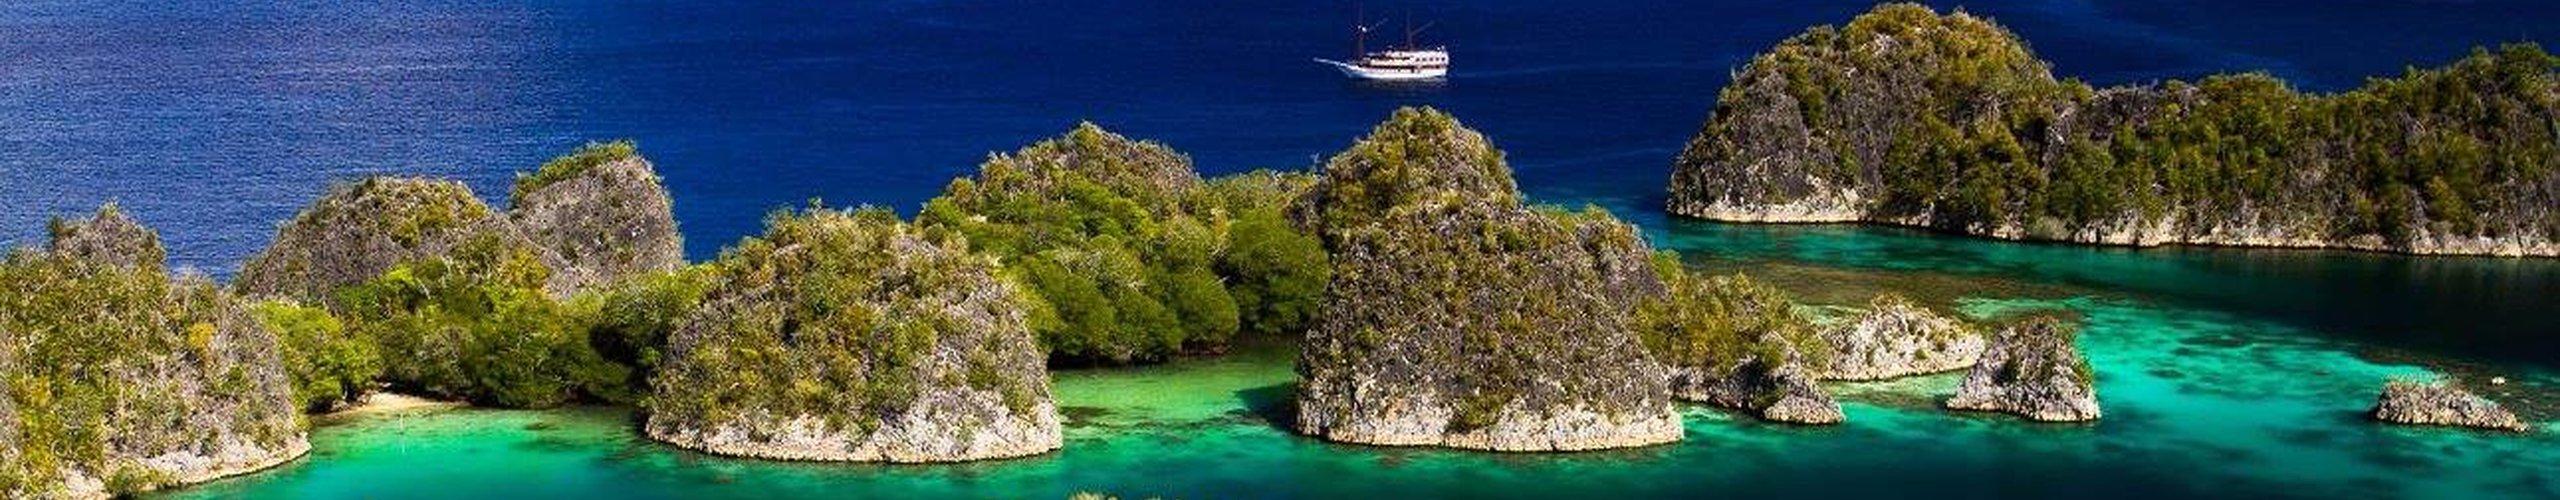 Sorong 2019: Best of Sorong, Indonesia Tourism - TripAdvisor